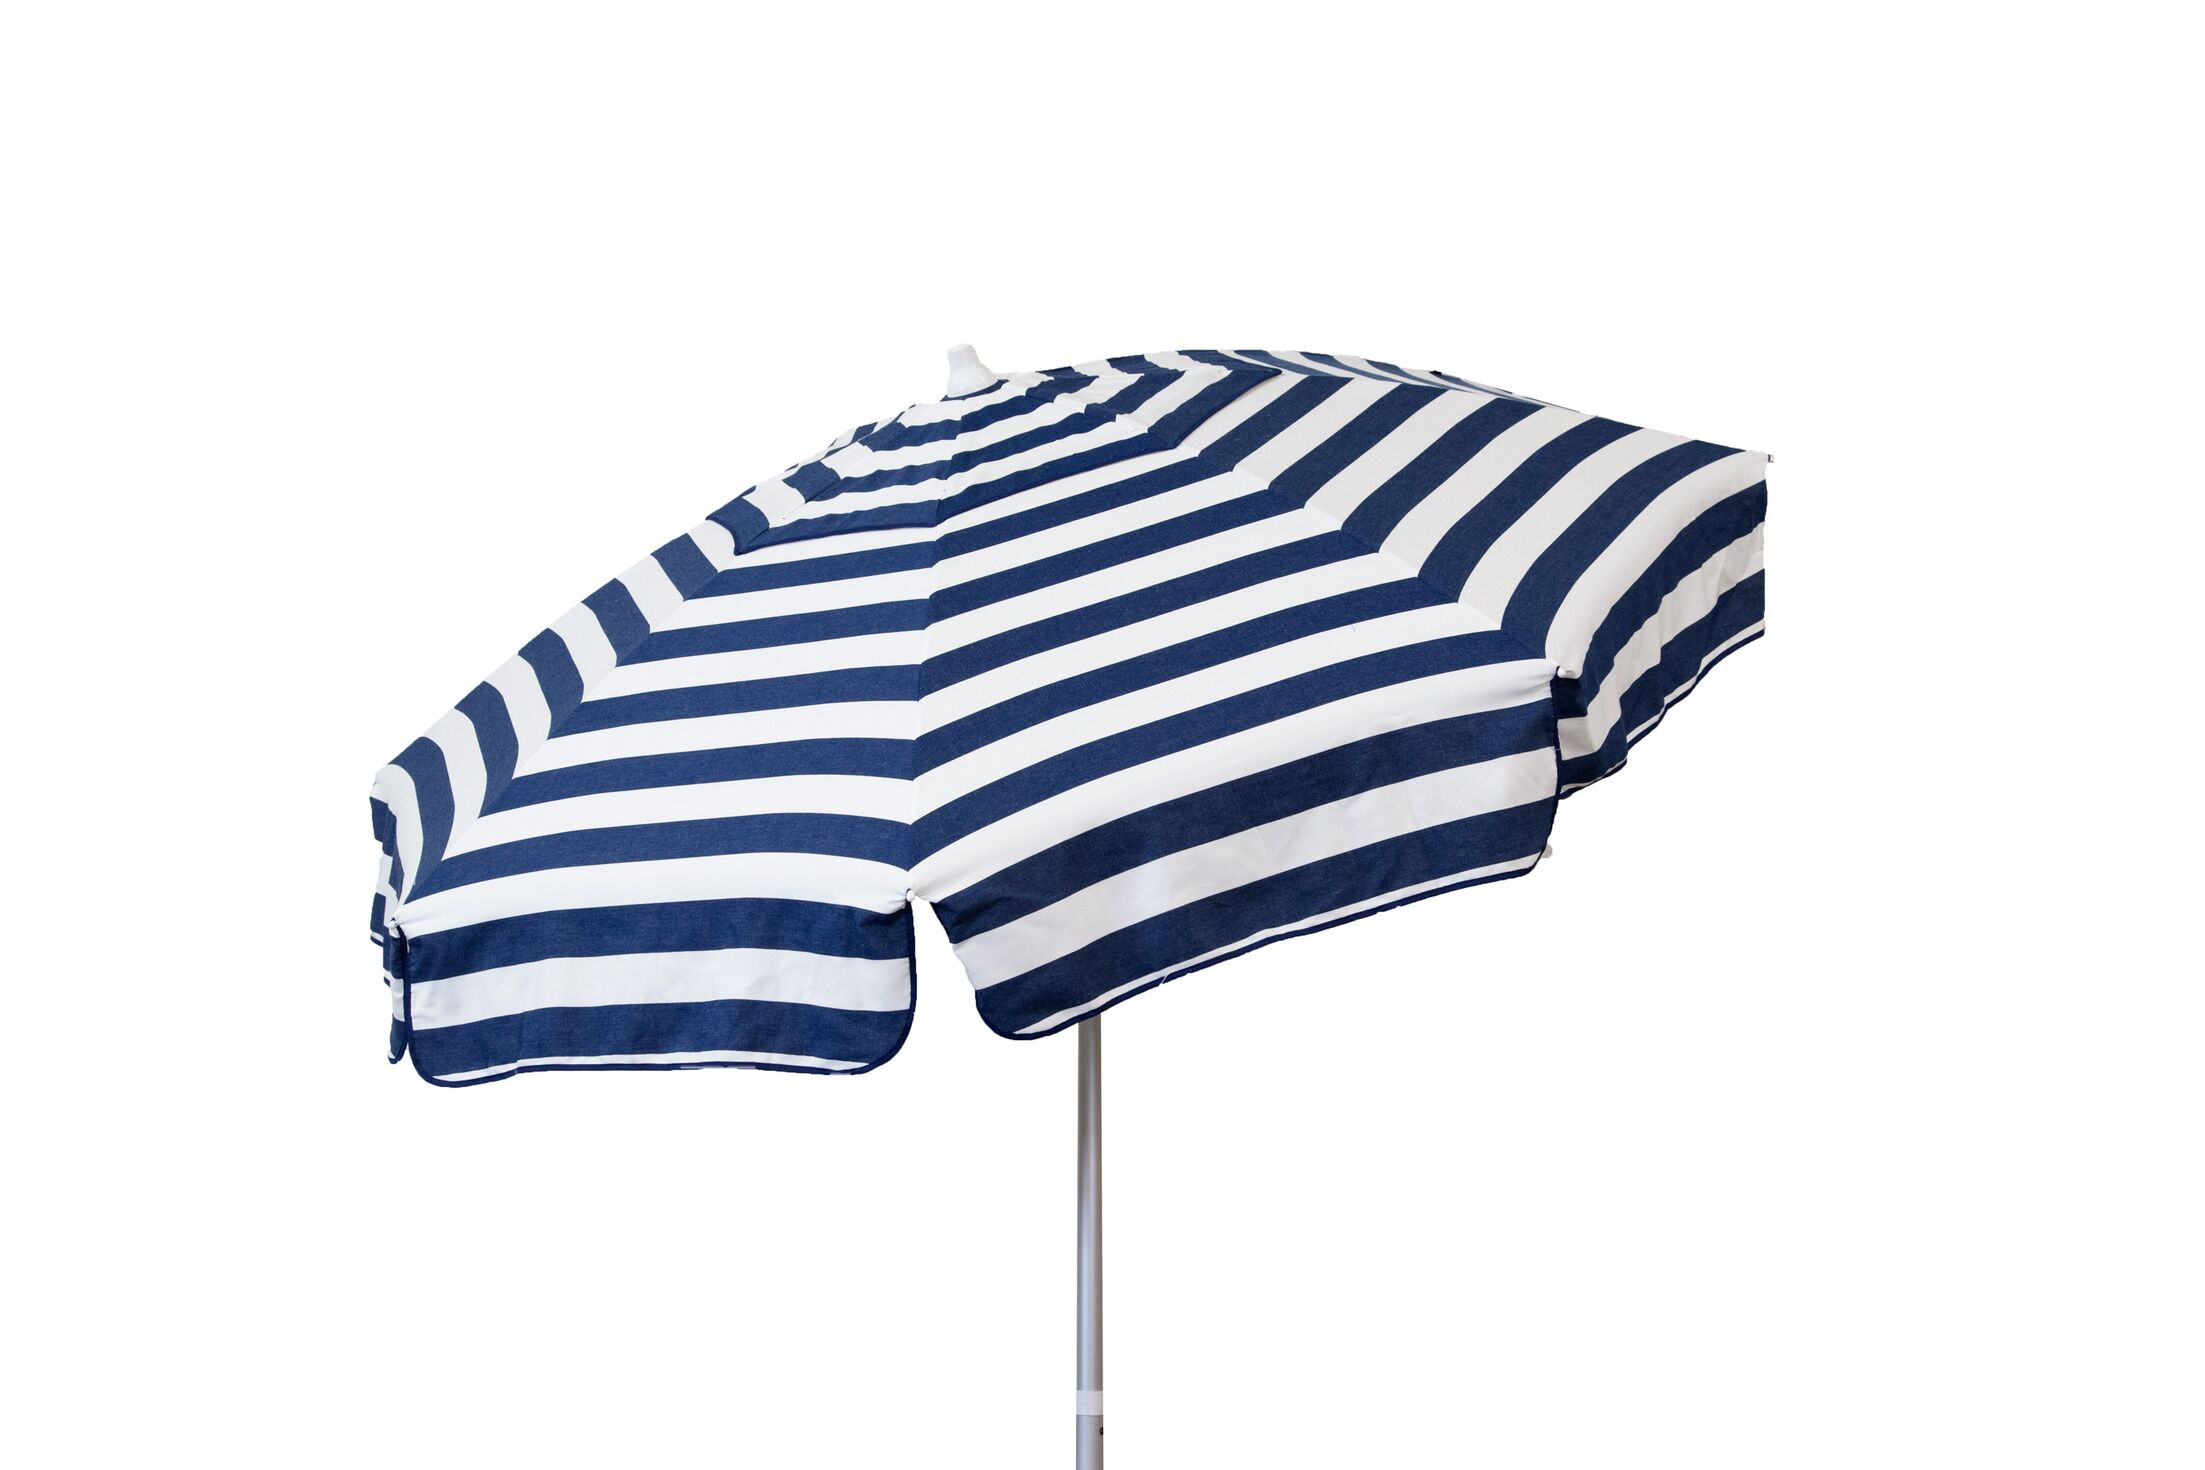 6' Beach Umbrella Color: Navy and White